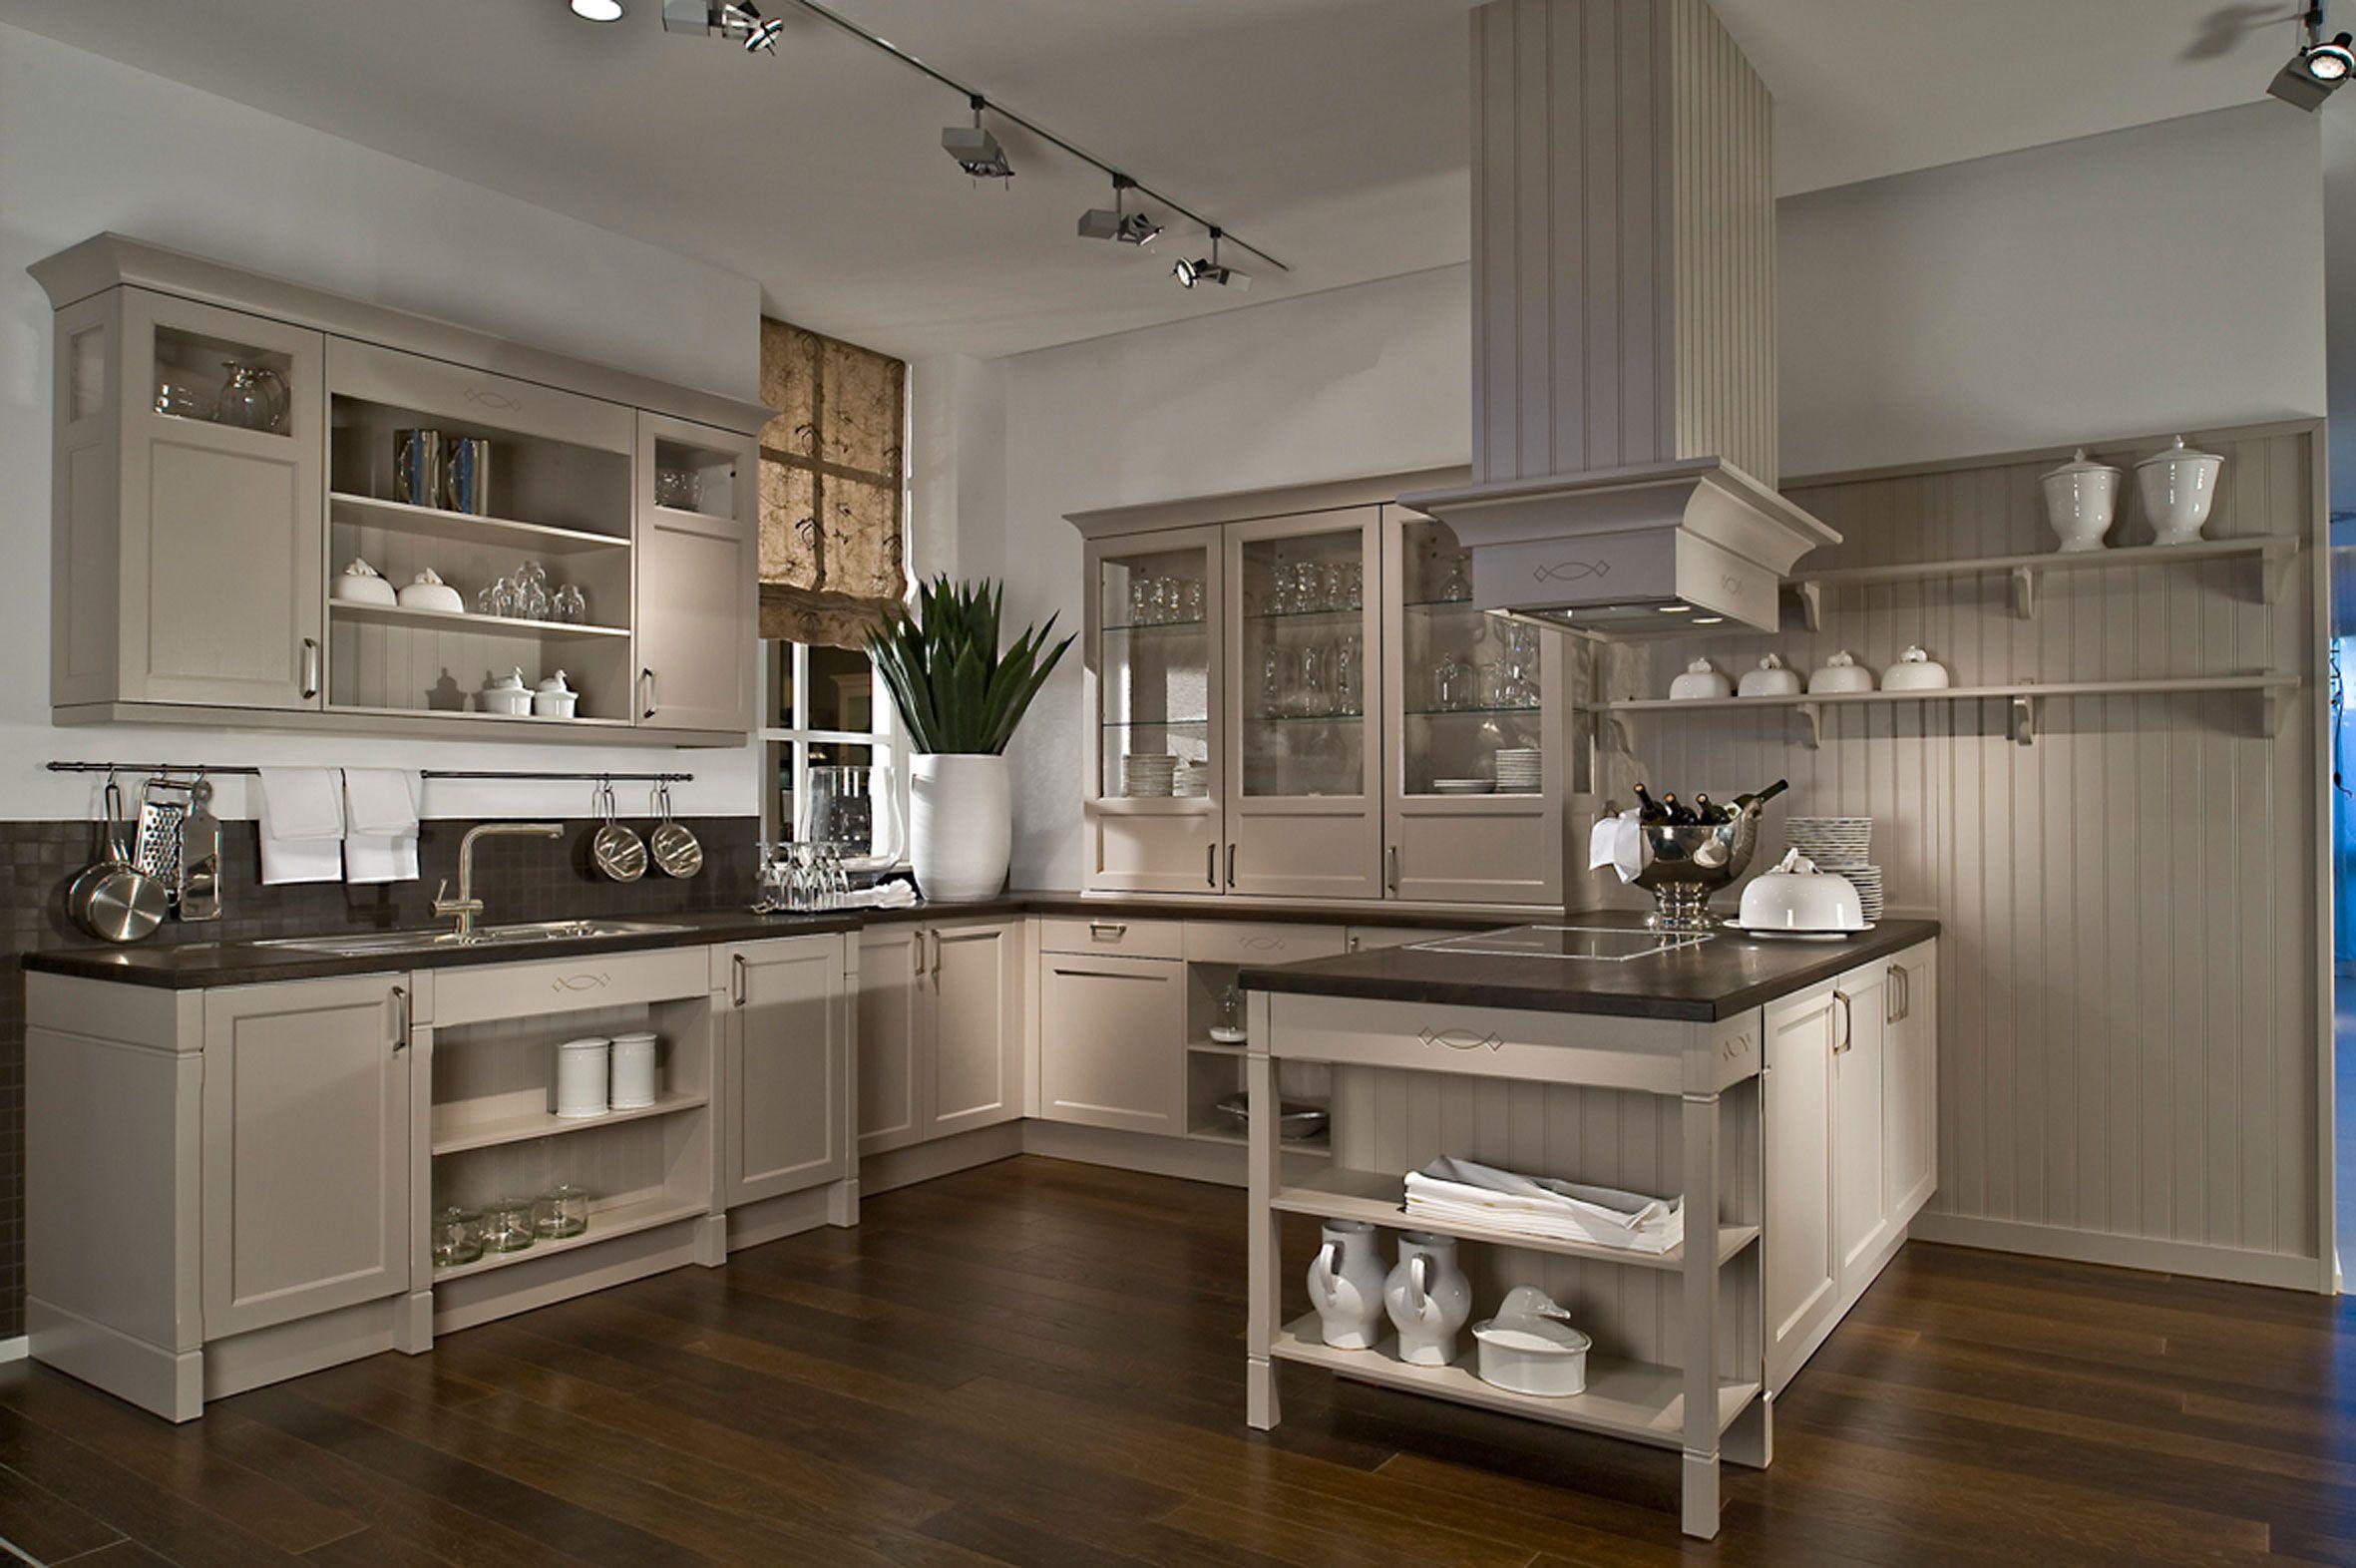 Berühmt Forbes 8 Küchentrends Zu Vermeiden Ideen - Küchenschrank ...